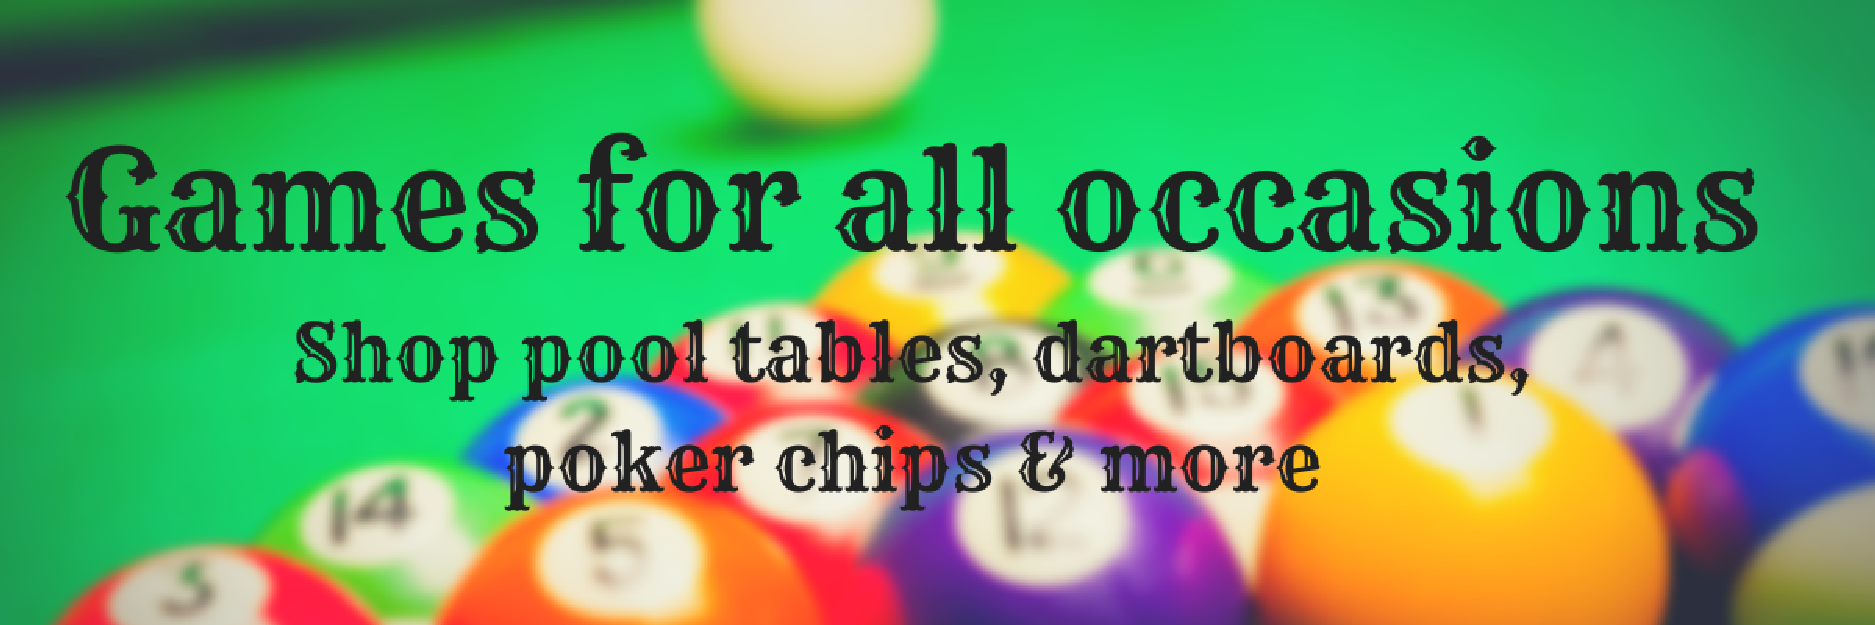 Discount poker shop discount code